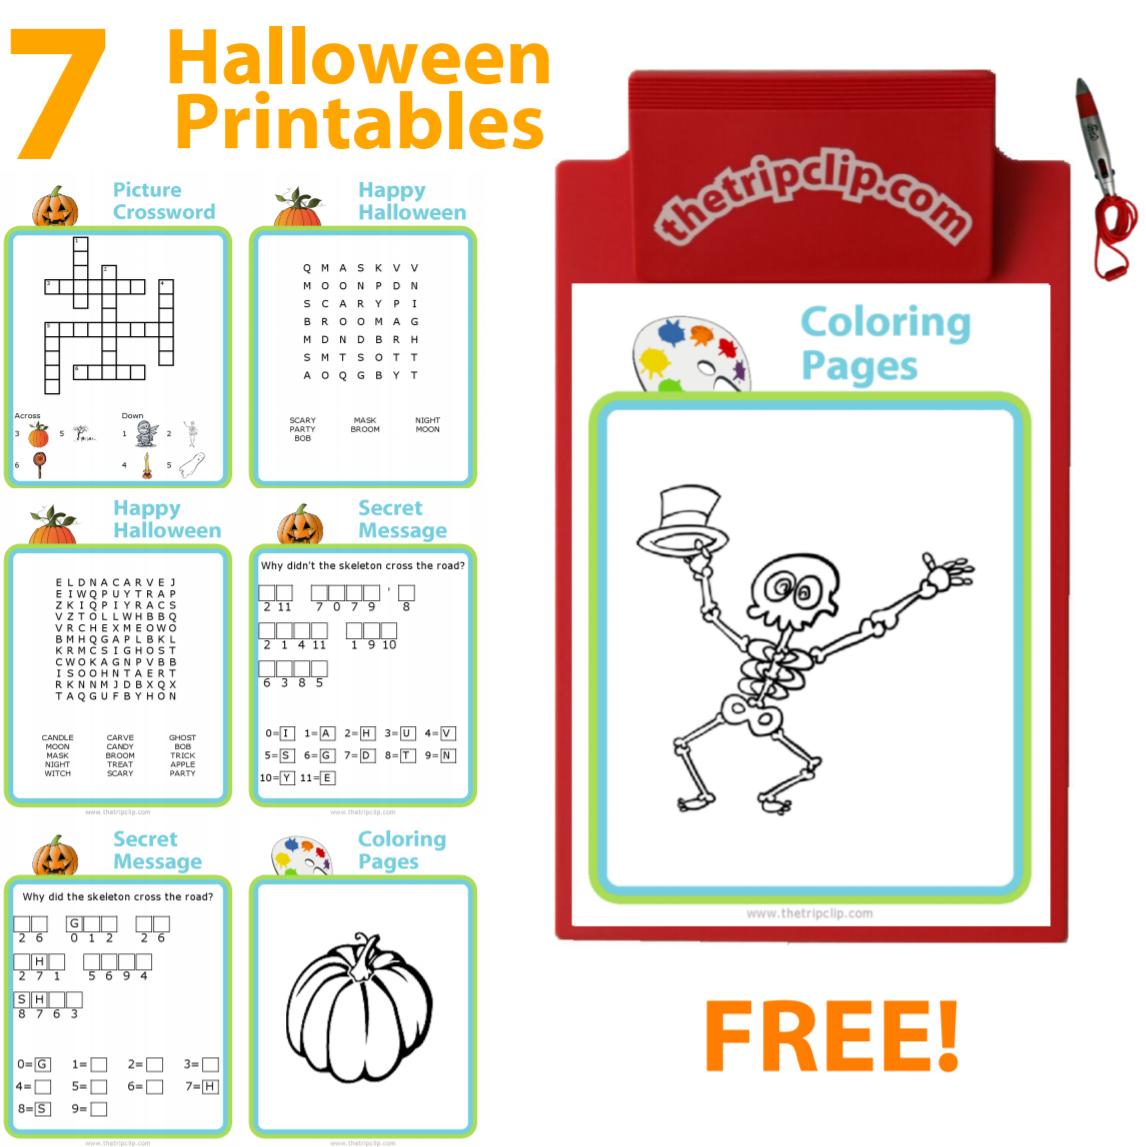 7 Free Halloween Printables